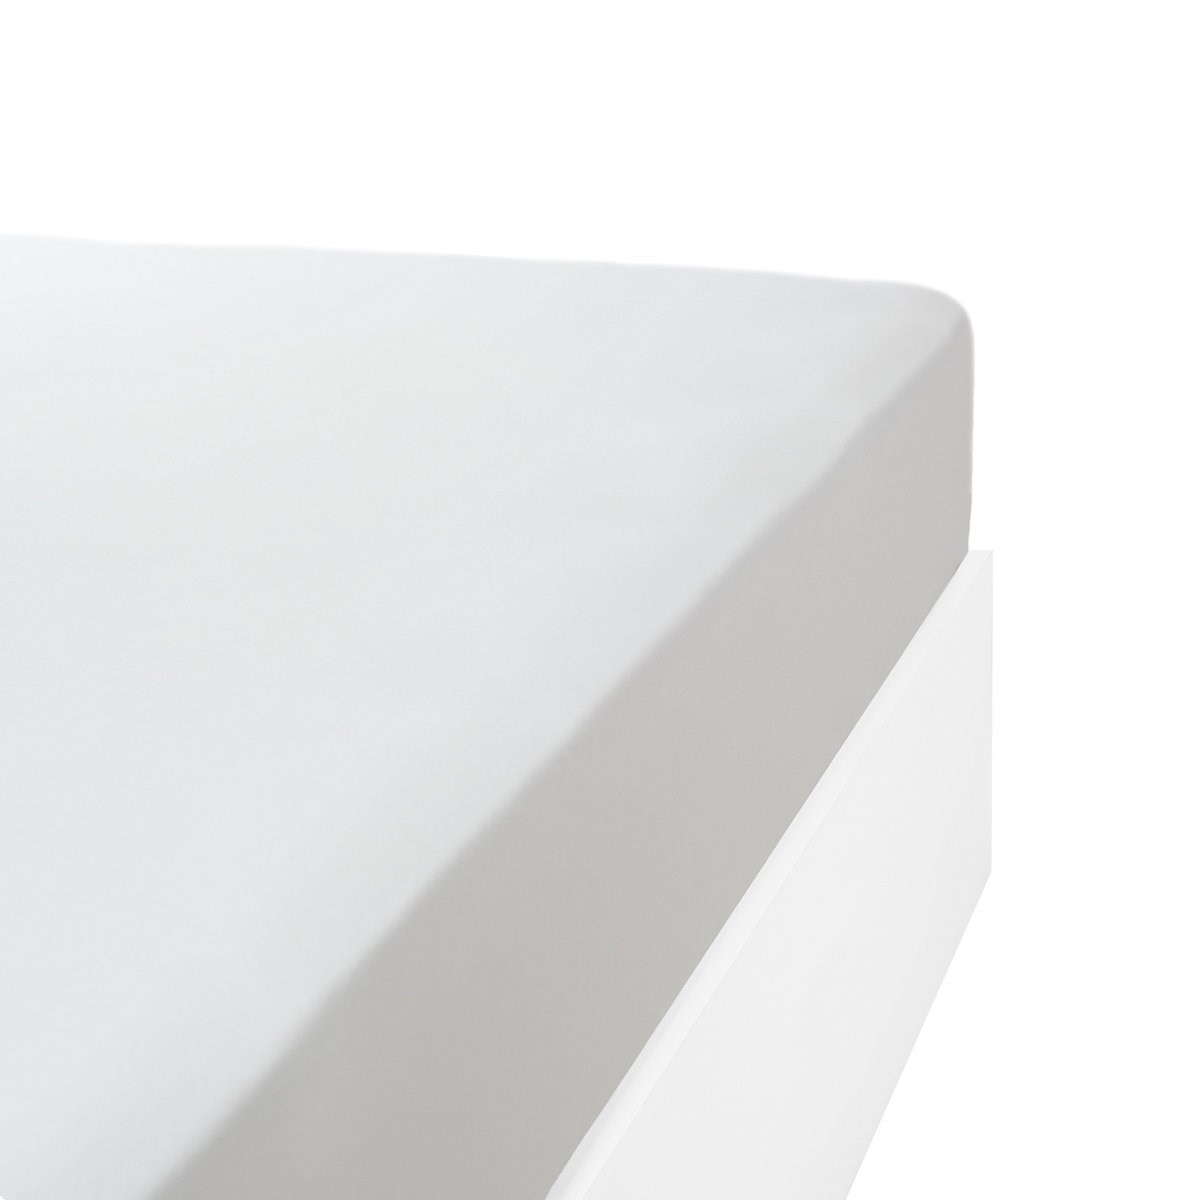 Drap housse jersey extensible en coton blanc 70x190 cm